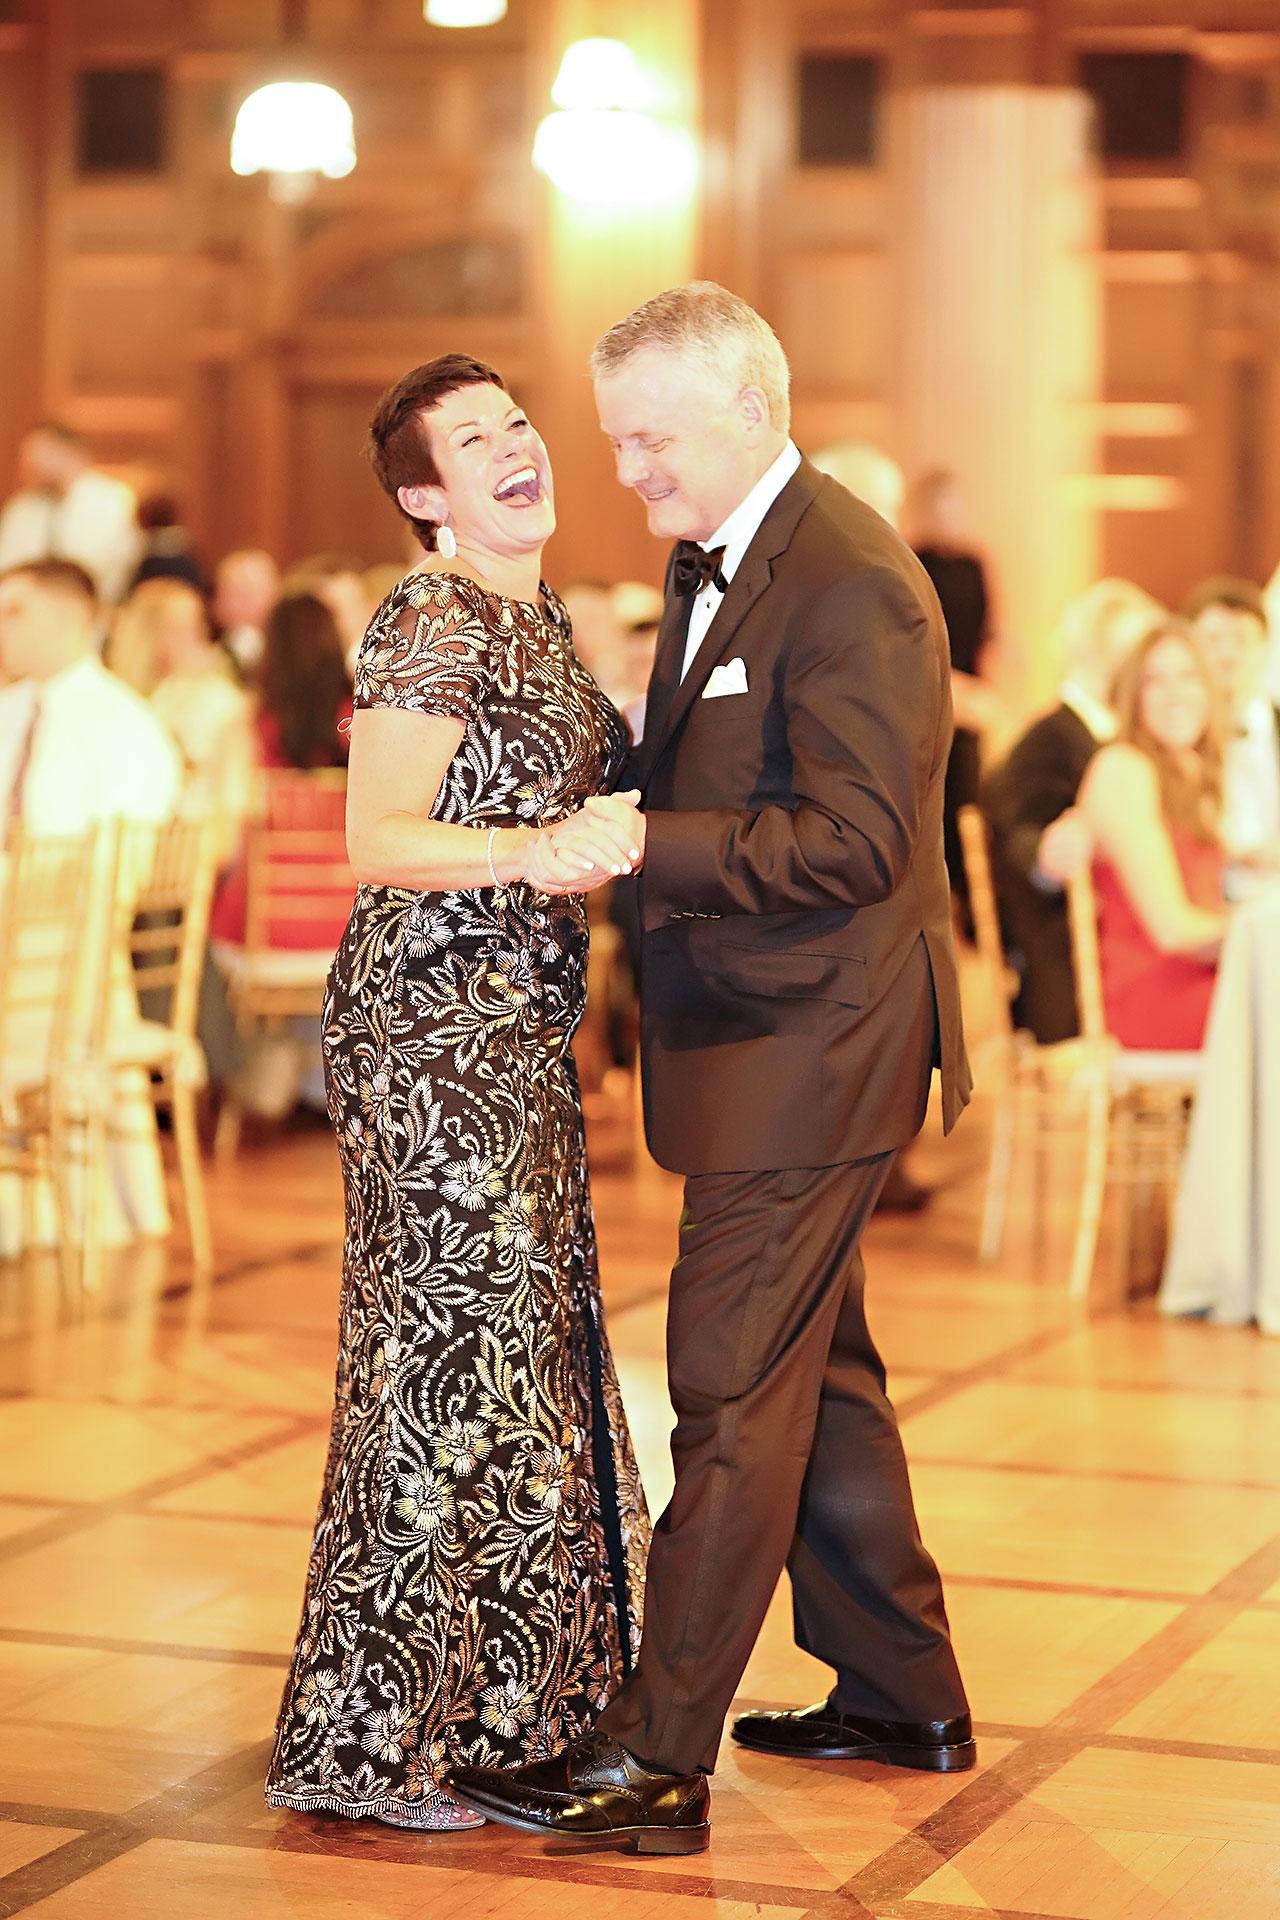 Erin Grant Indianapolis Central Library Scottish Rite Wedding 331